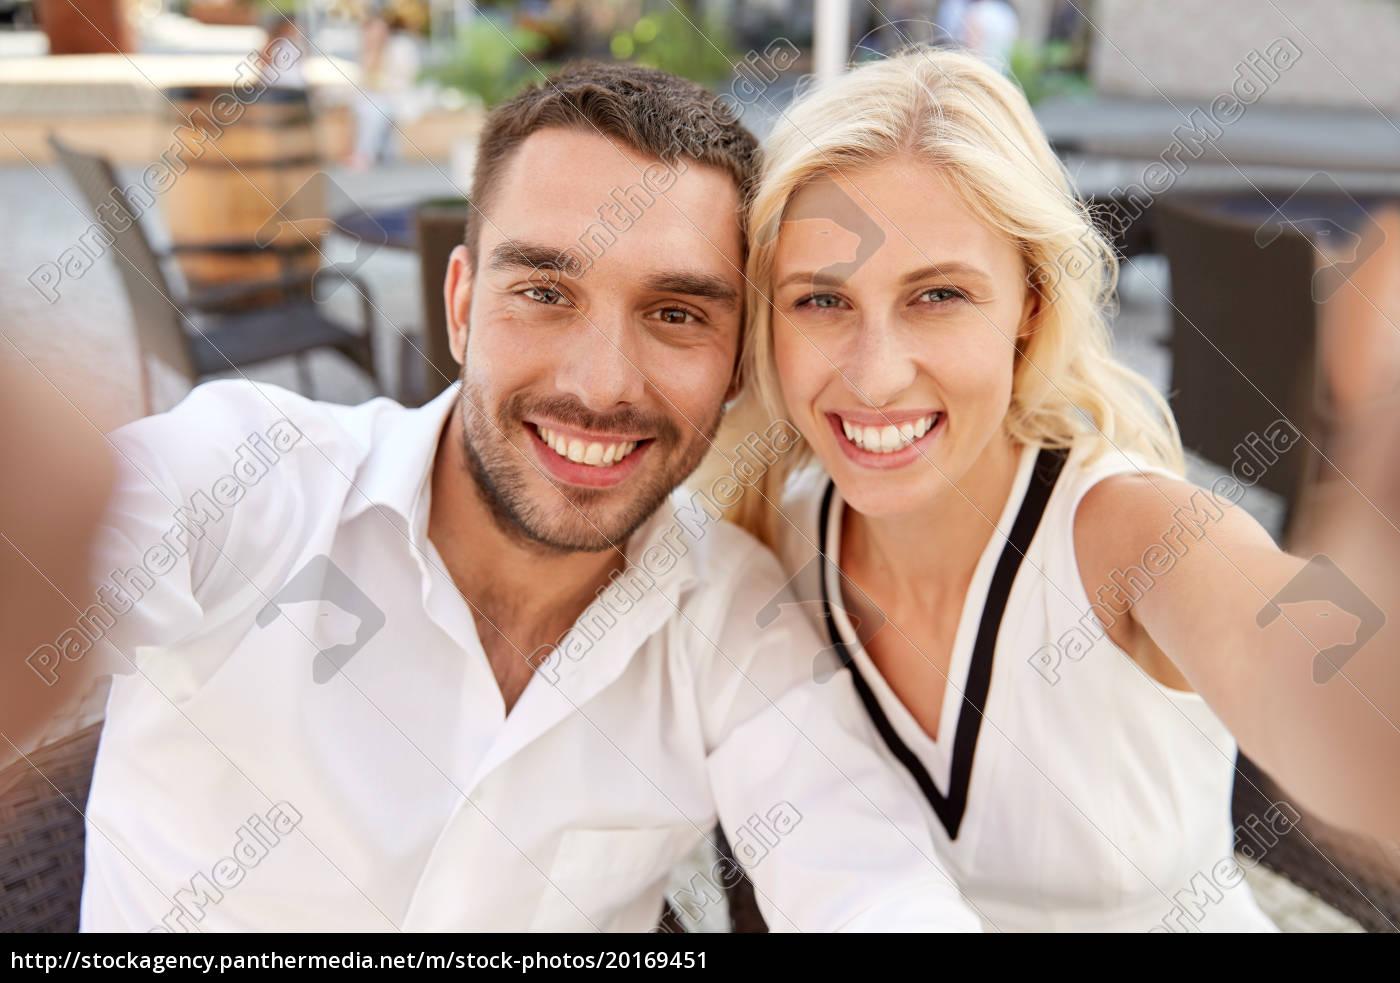 happy, couple, taking, selfie, at, restaurant - 20169451